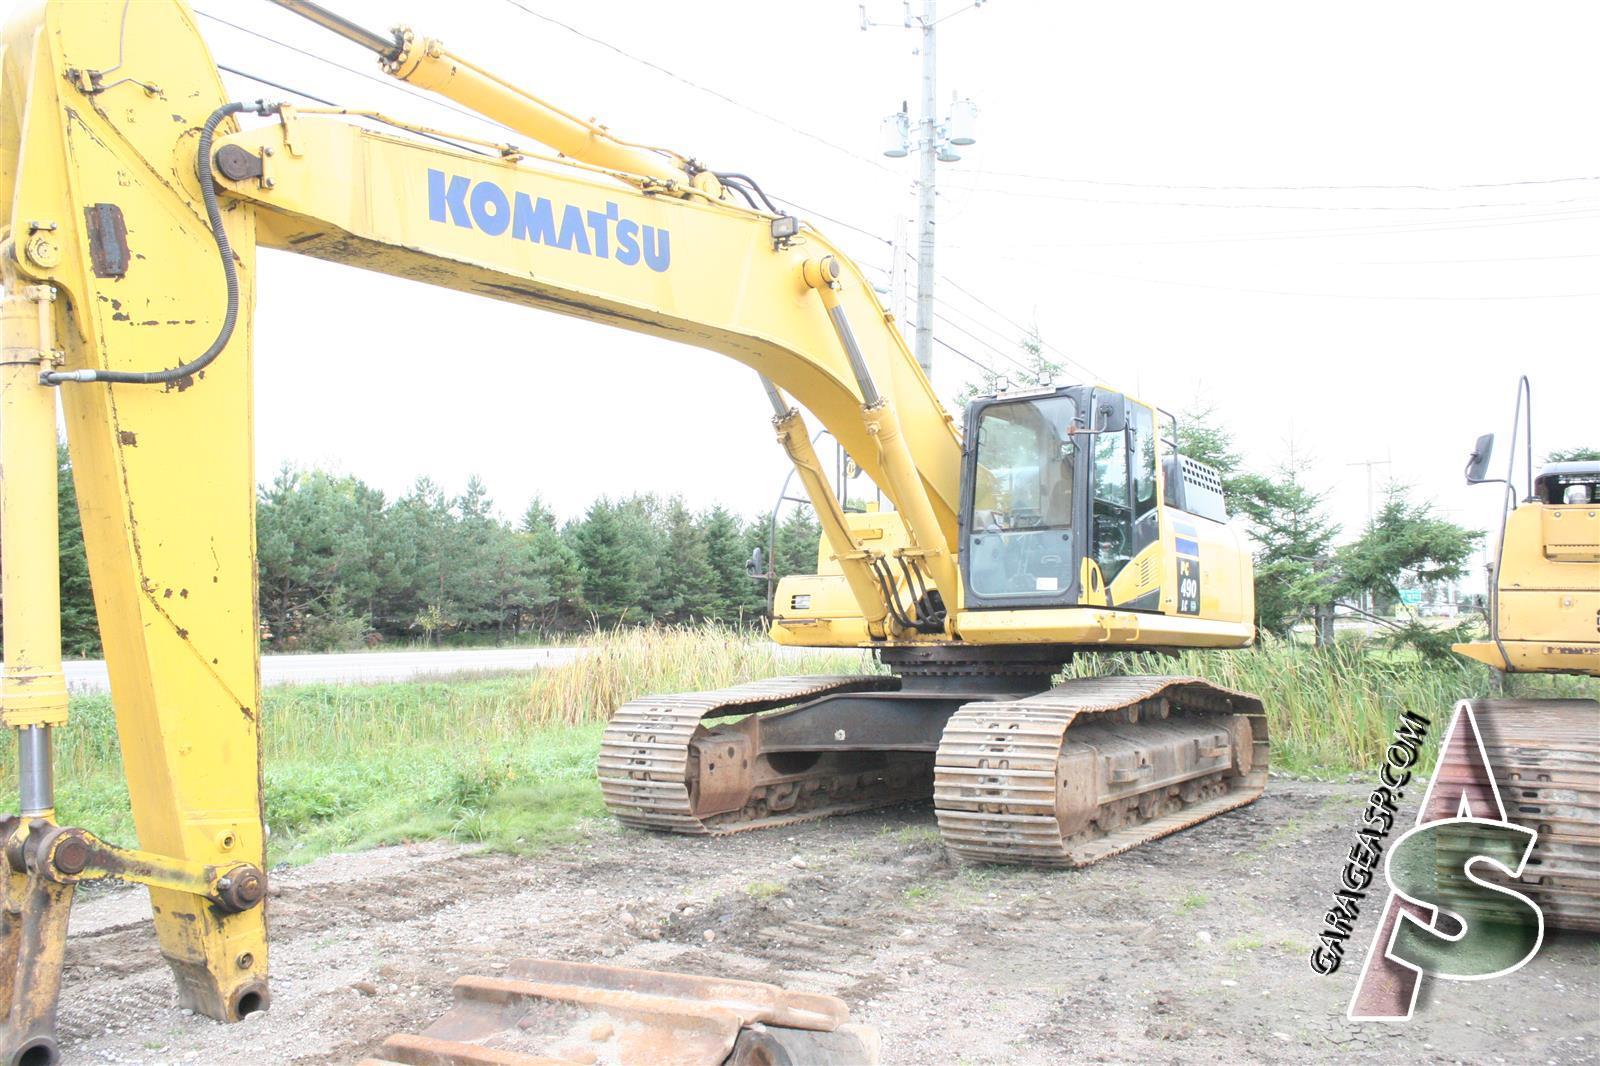 Komatsu Hydraulic Cylinders - Heavy equipment parts